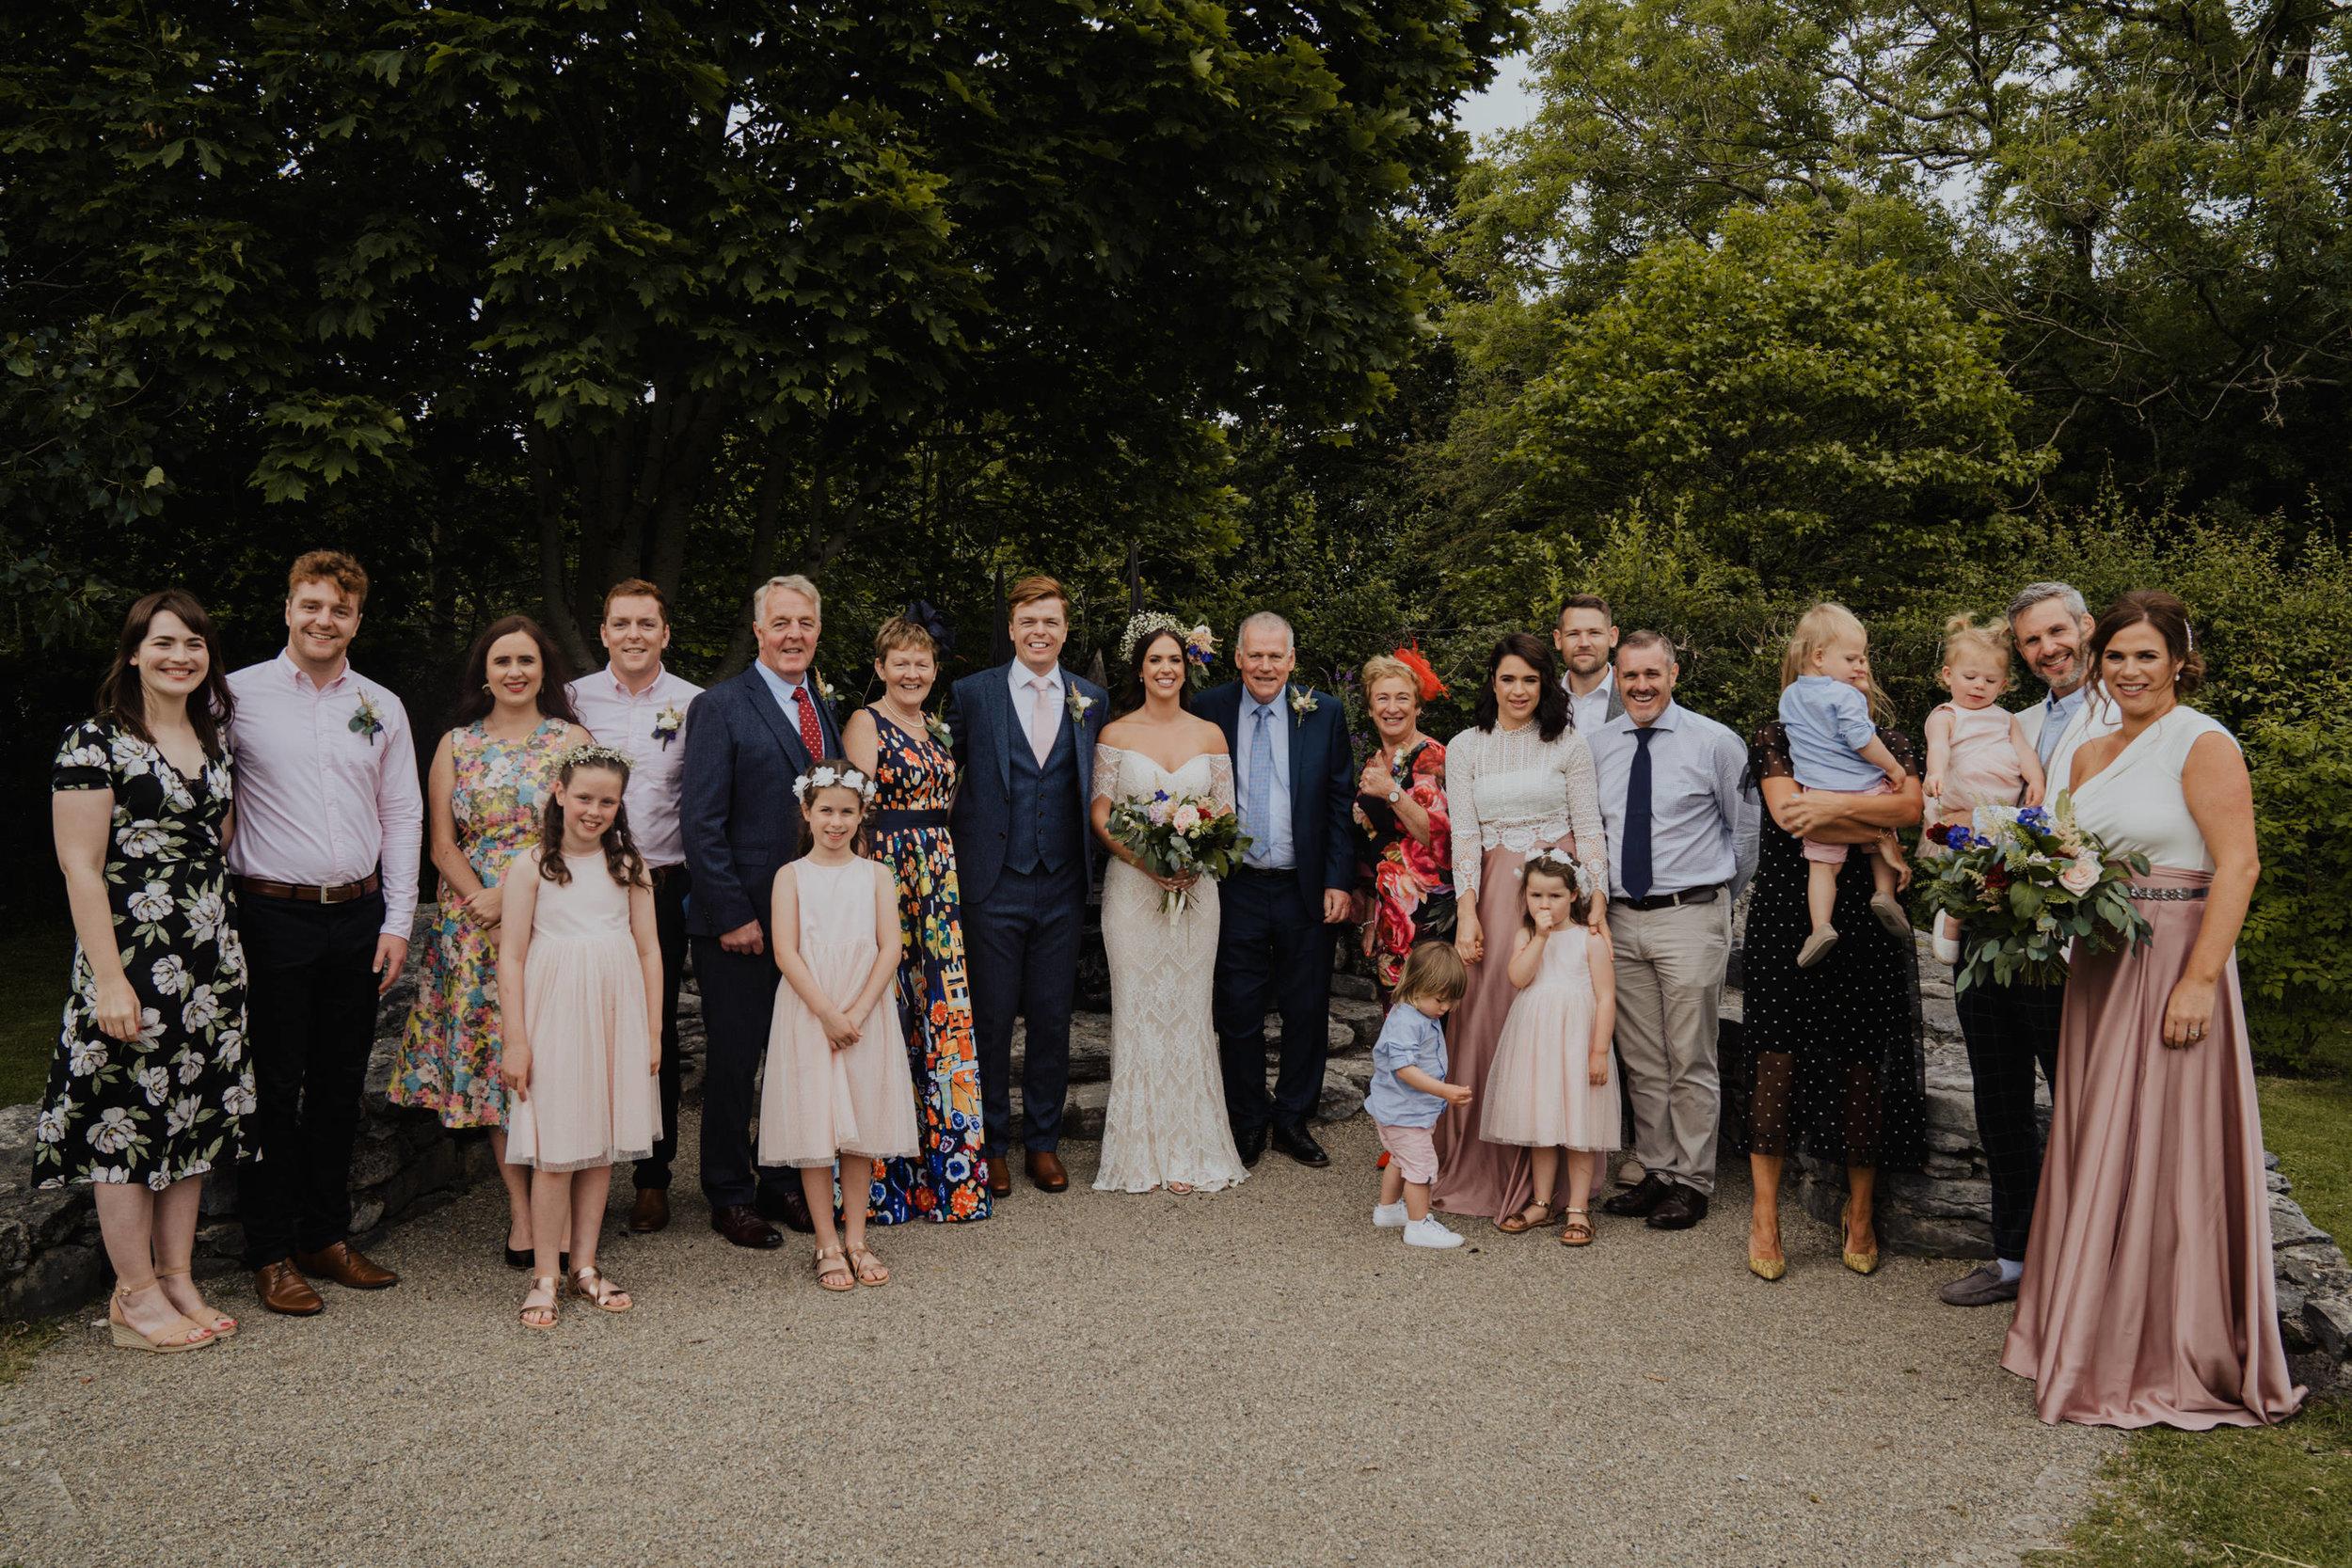 c&j_brigits_garden_galway_wedding_photographer_livia_figueiredo_27.jpg